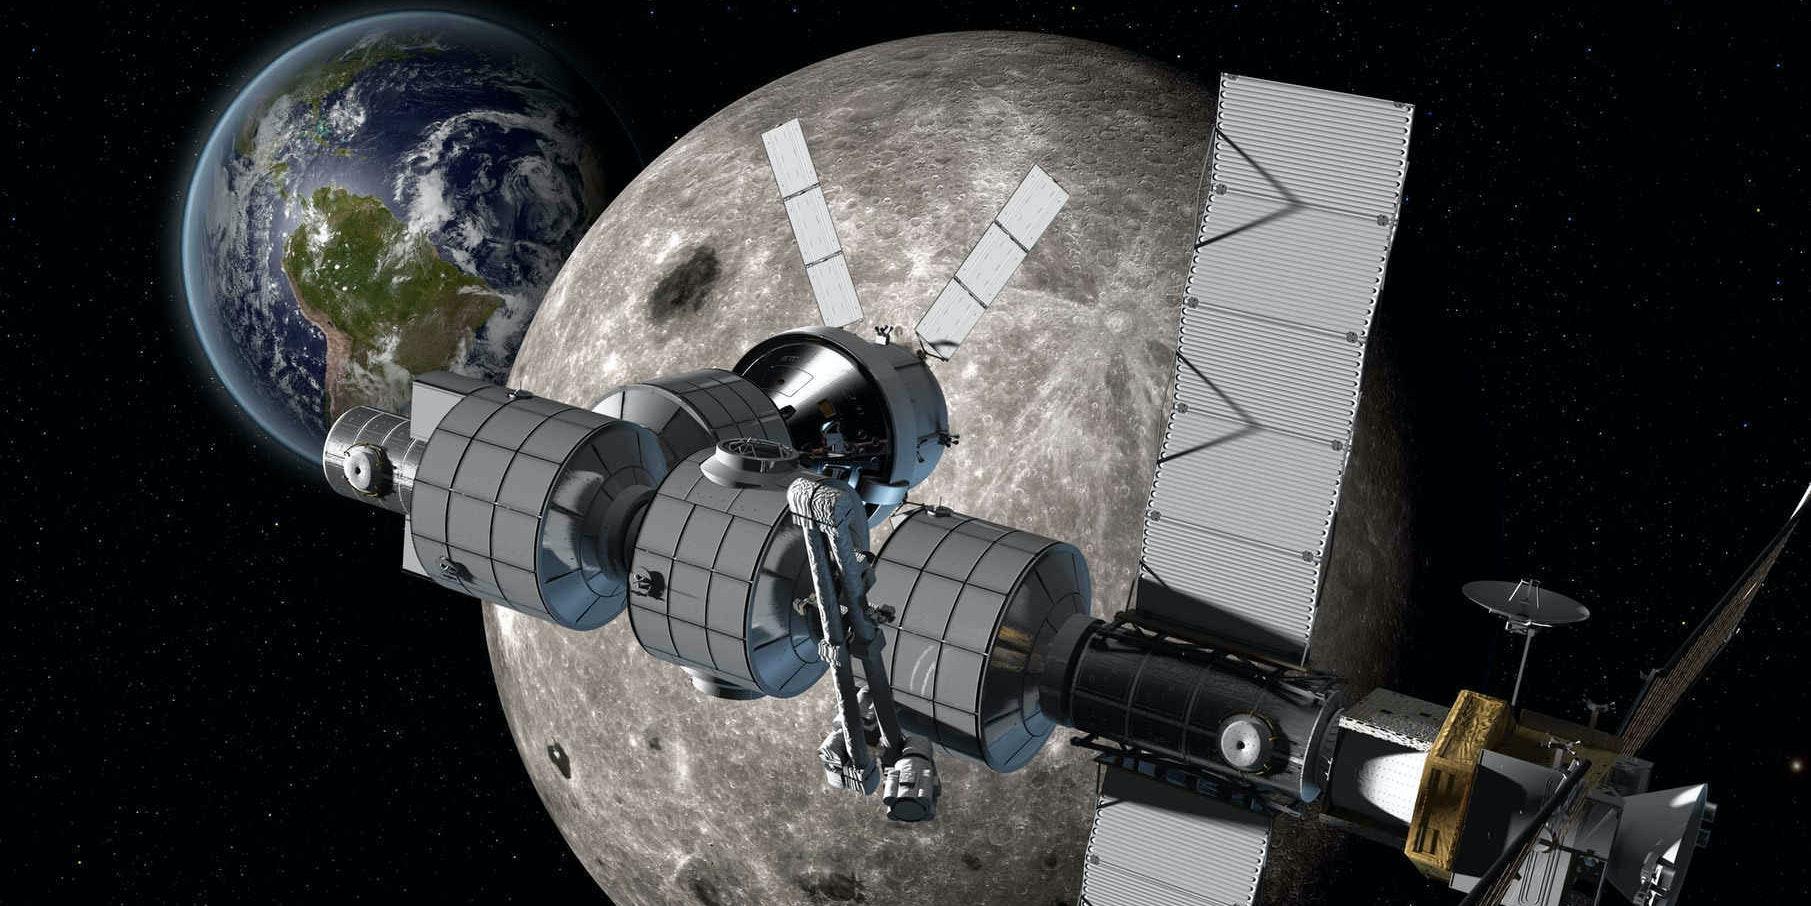 Artist's rendering of Boeing's proposed crewed lunar station.